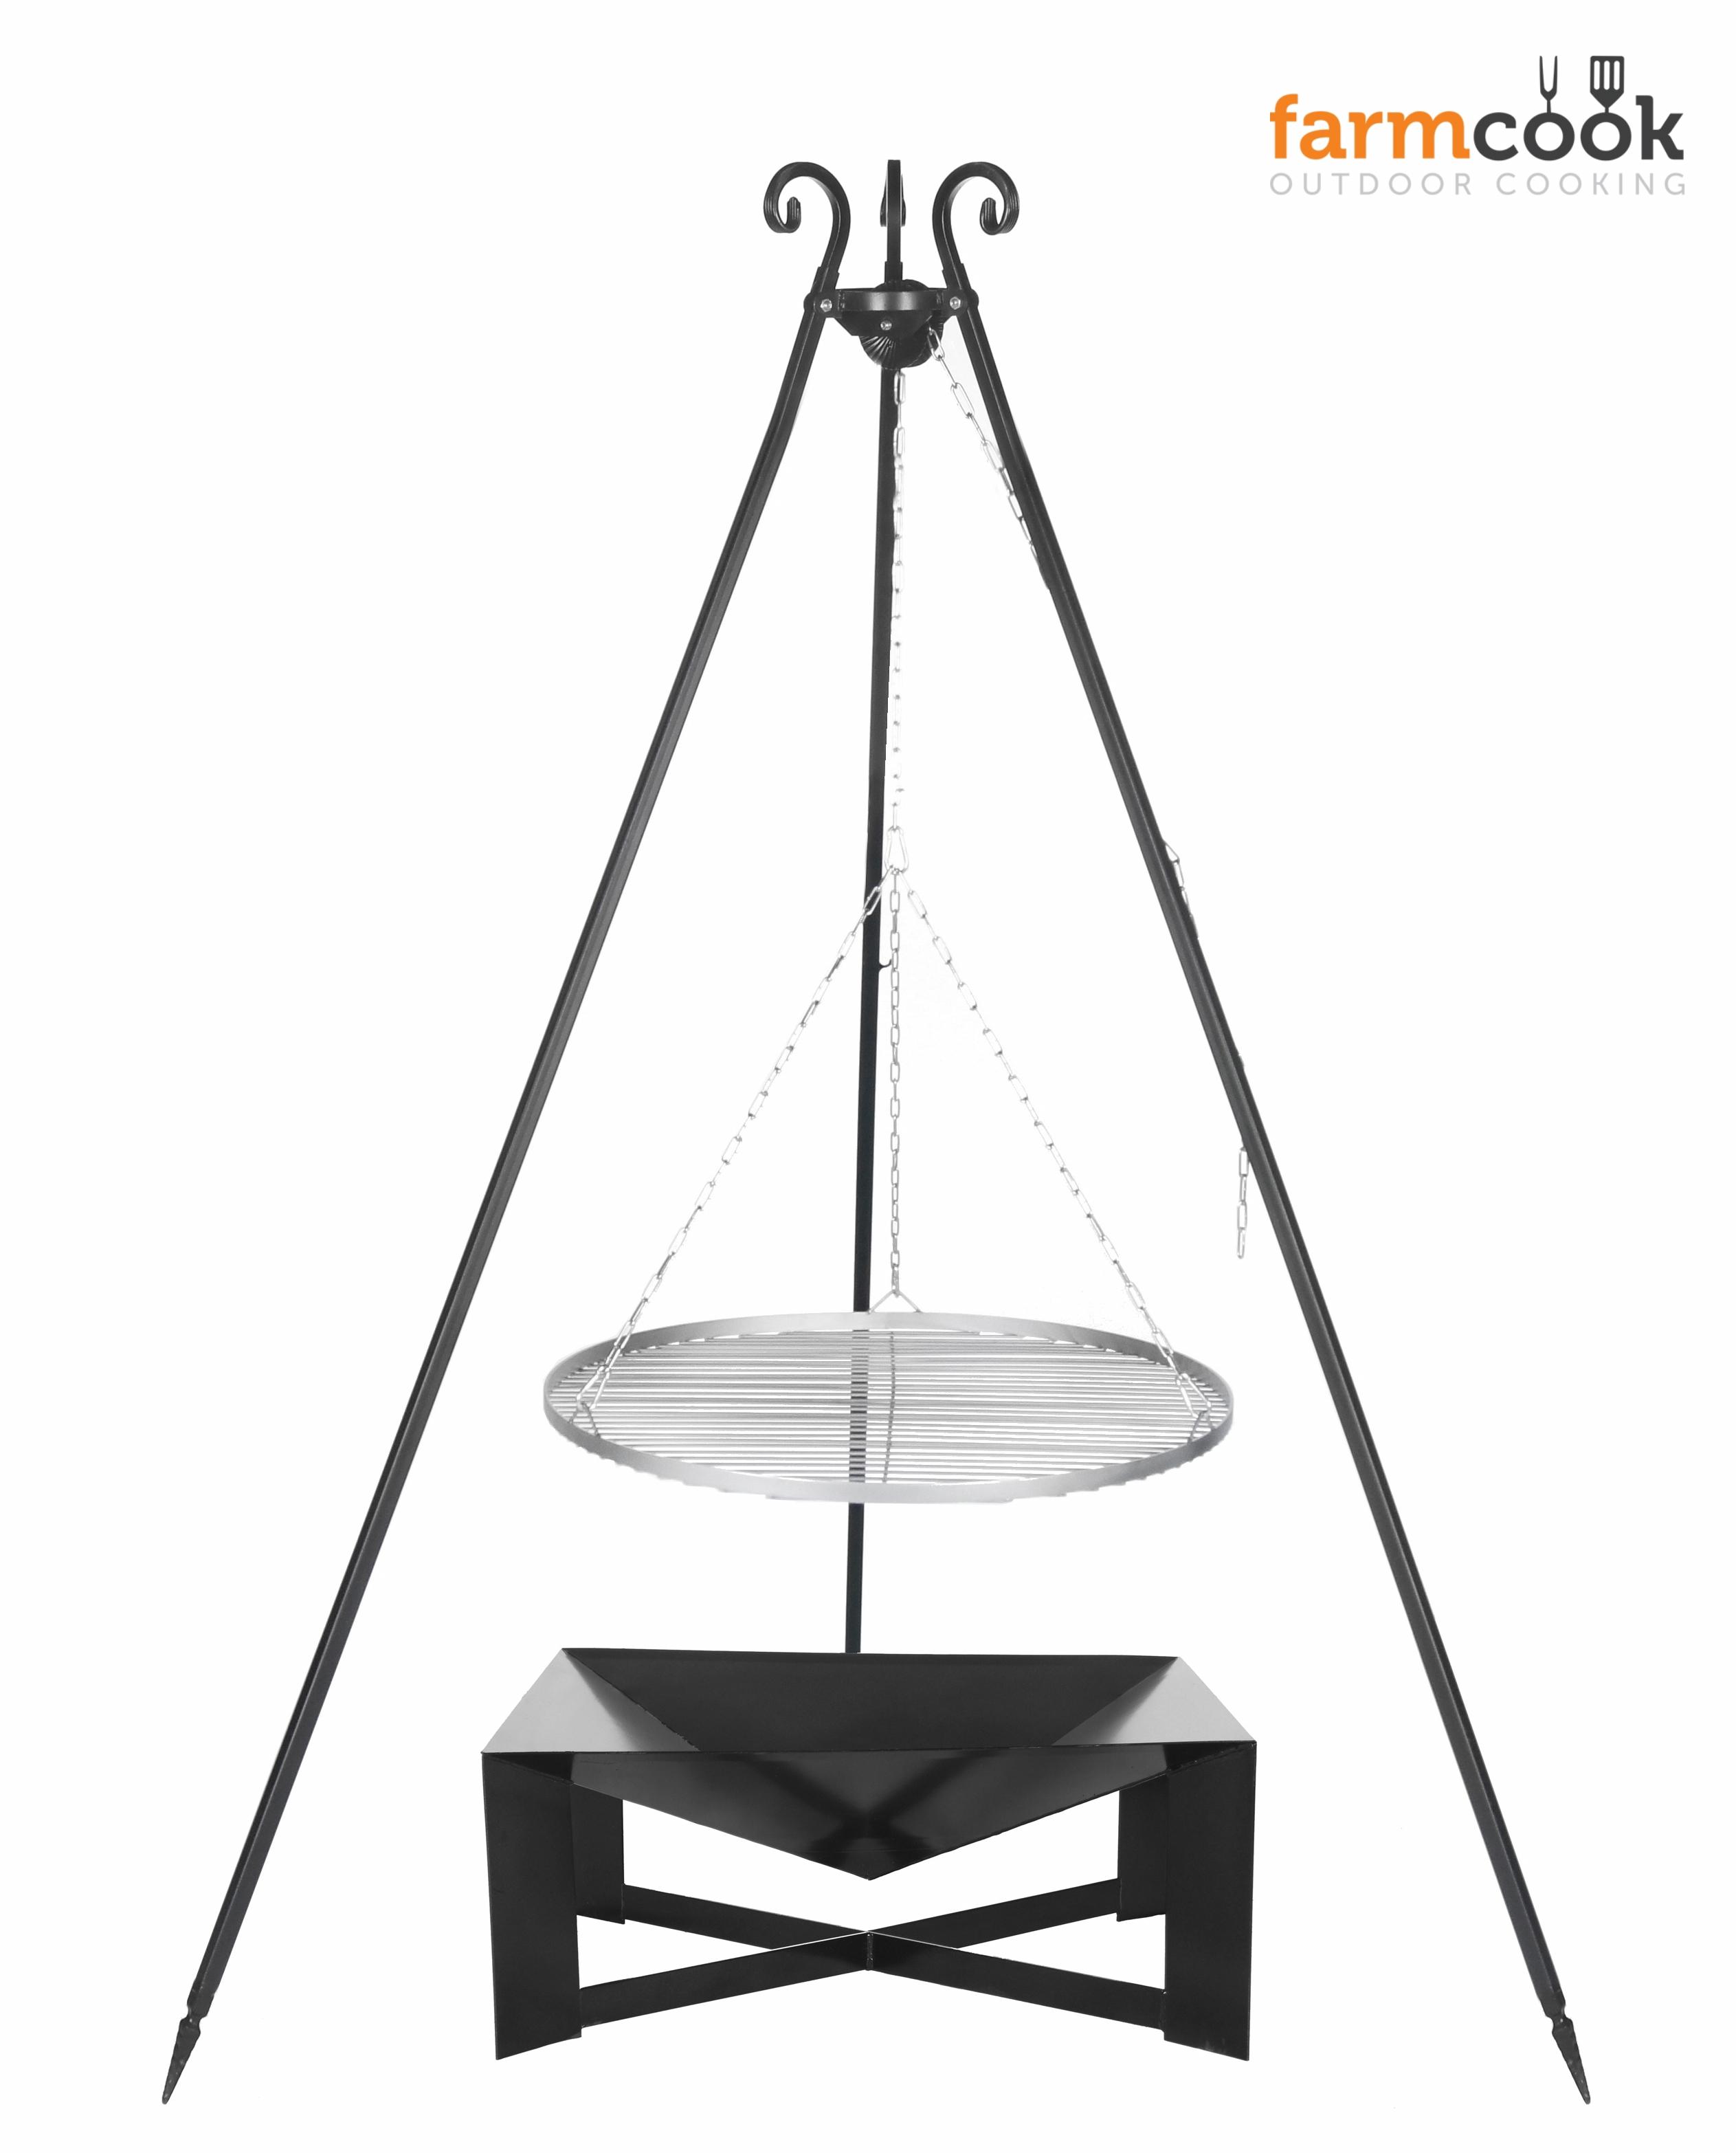 farmcook schwenkgrill feuerschale pan34 edelstahlrost 70 dreibein viking artnr e00773. Black Bedroom Furniture Sets. Home Design Ideas